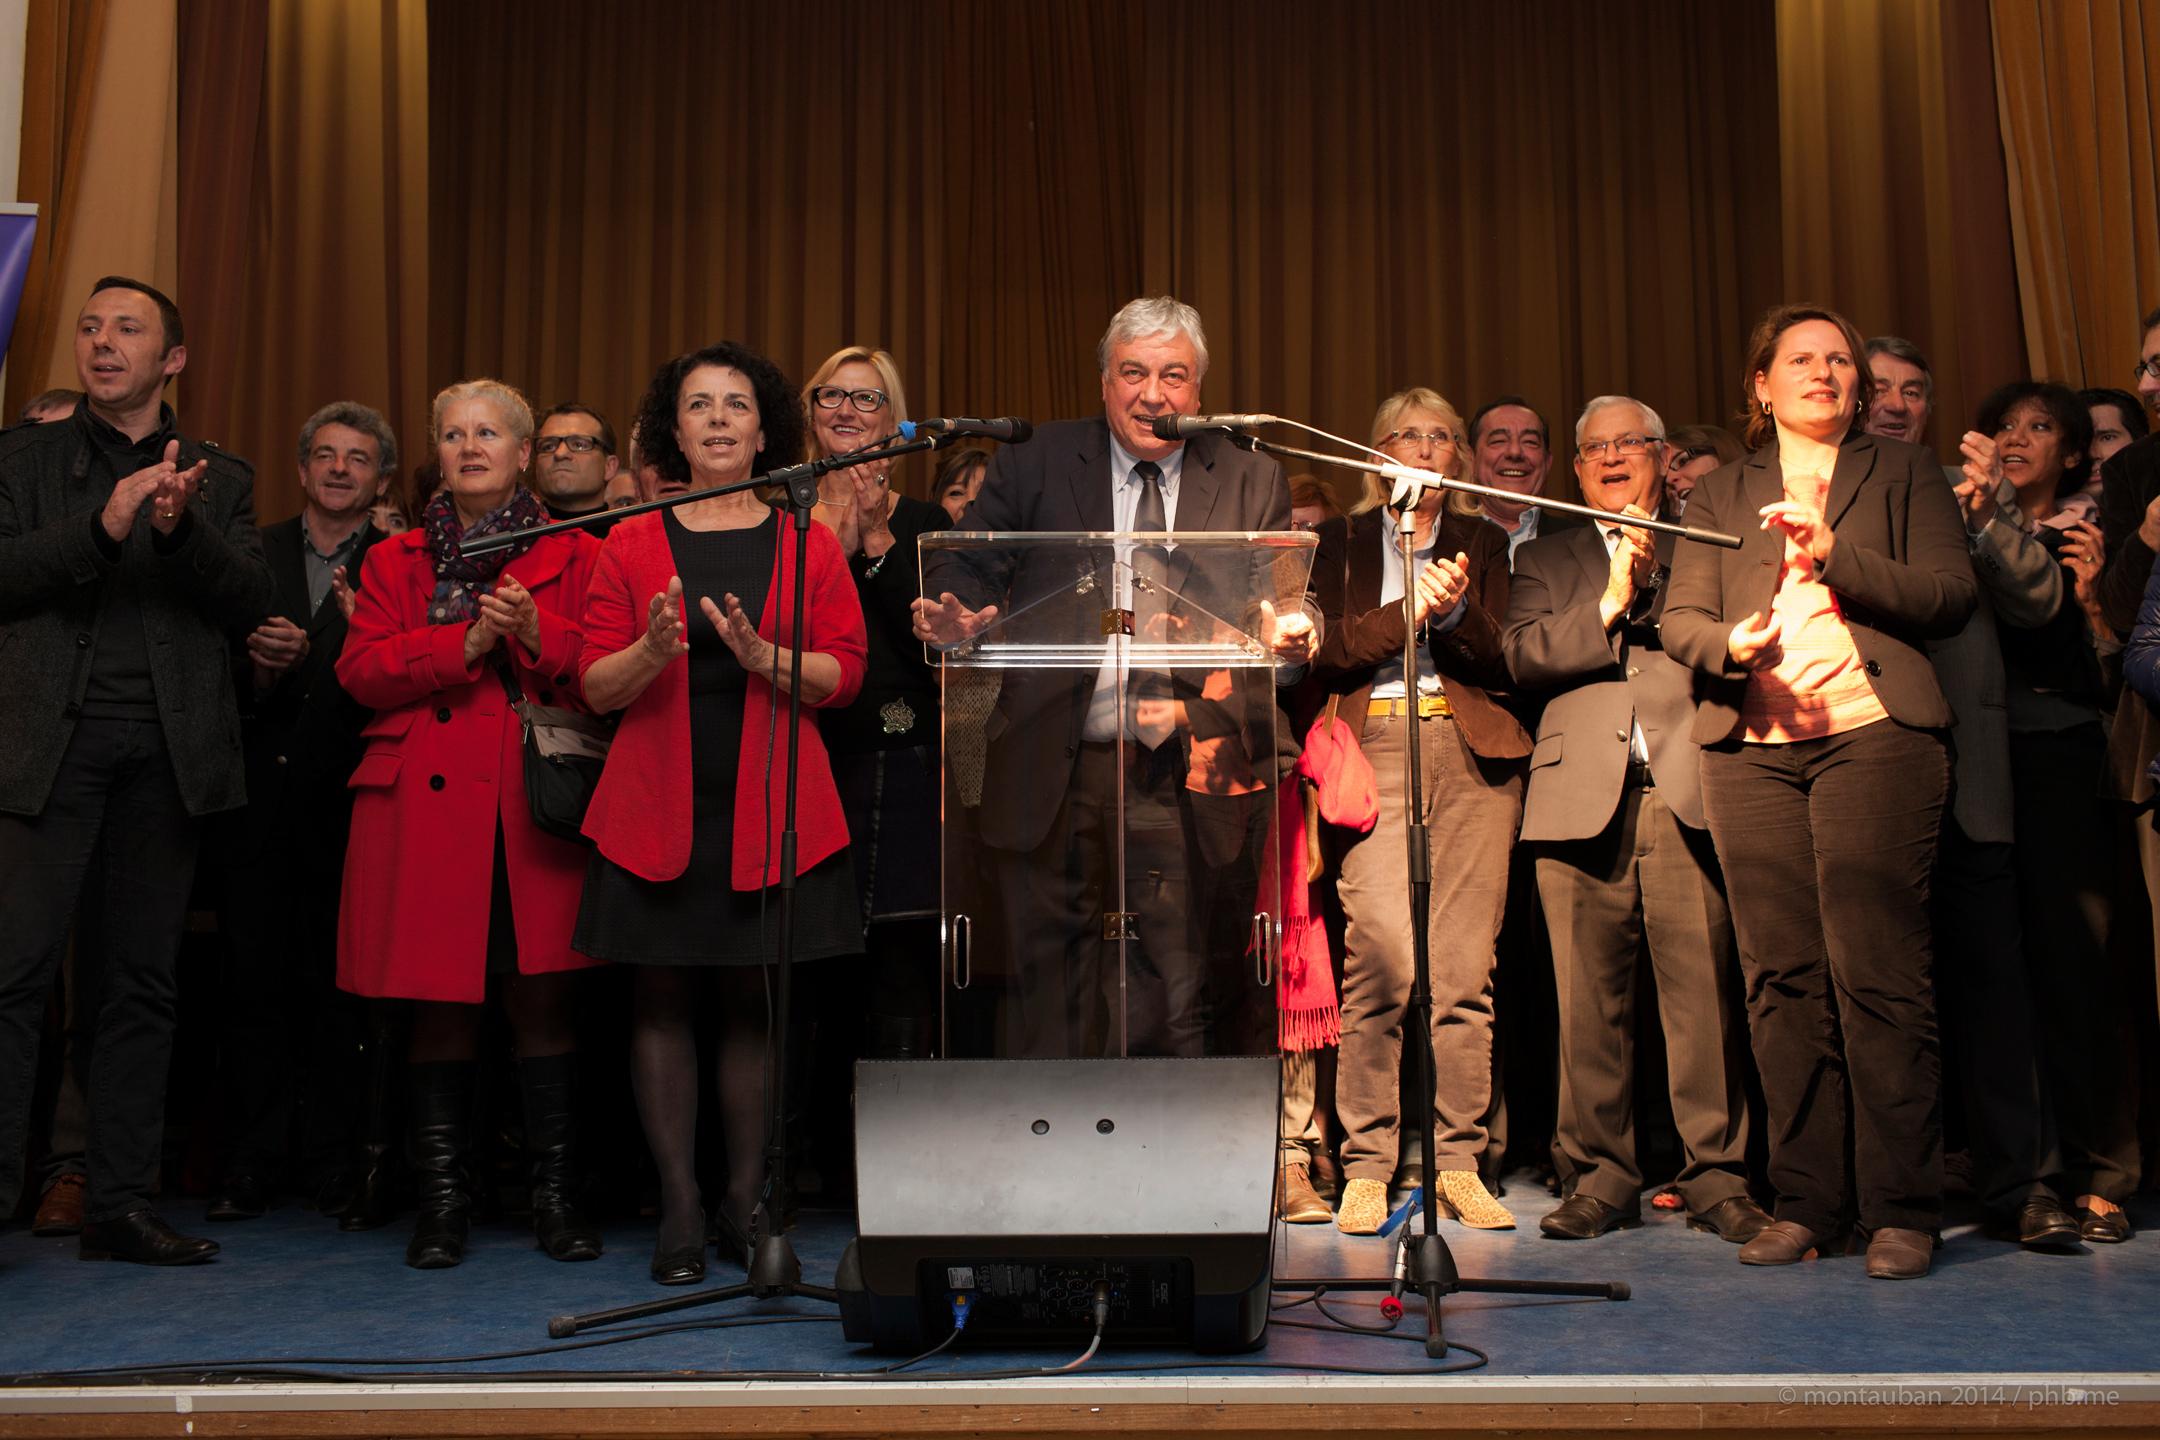 Montauban-2014-Rassemblement-peuple-gauche-vote-IMG_3382